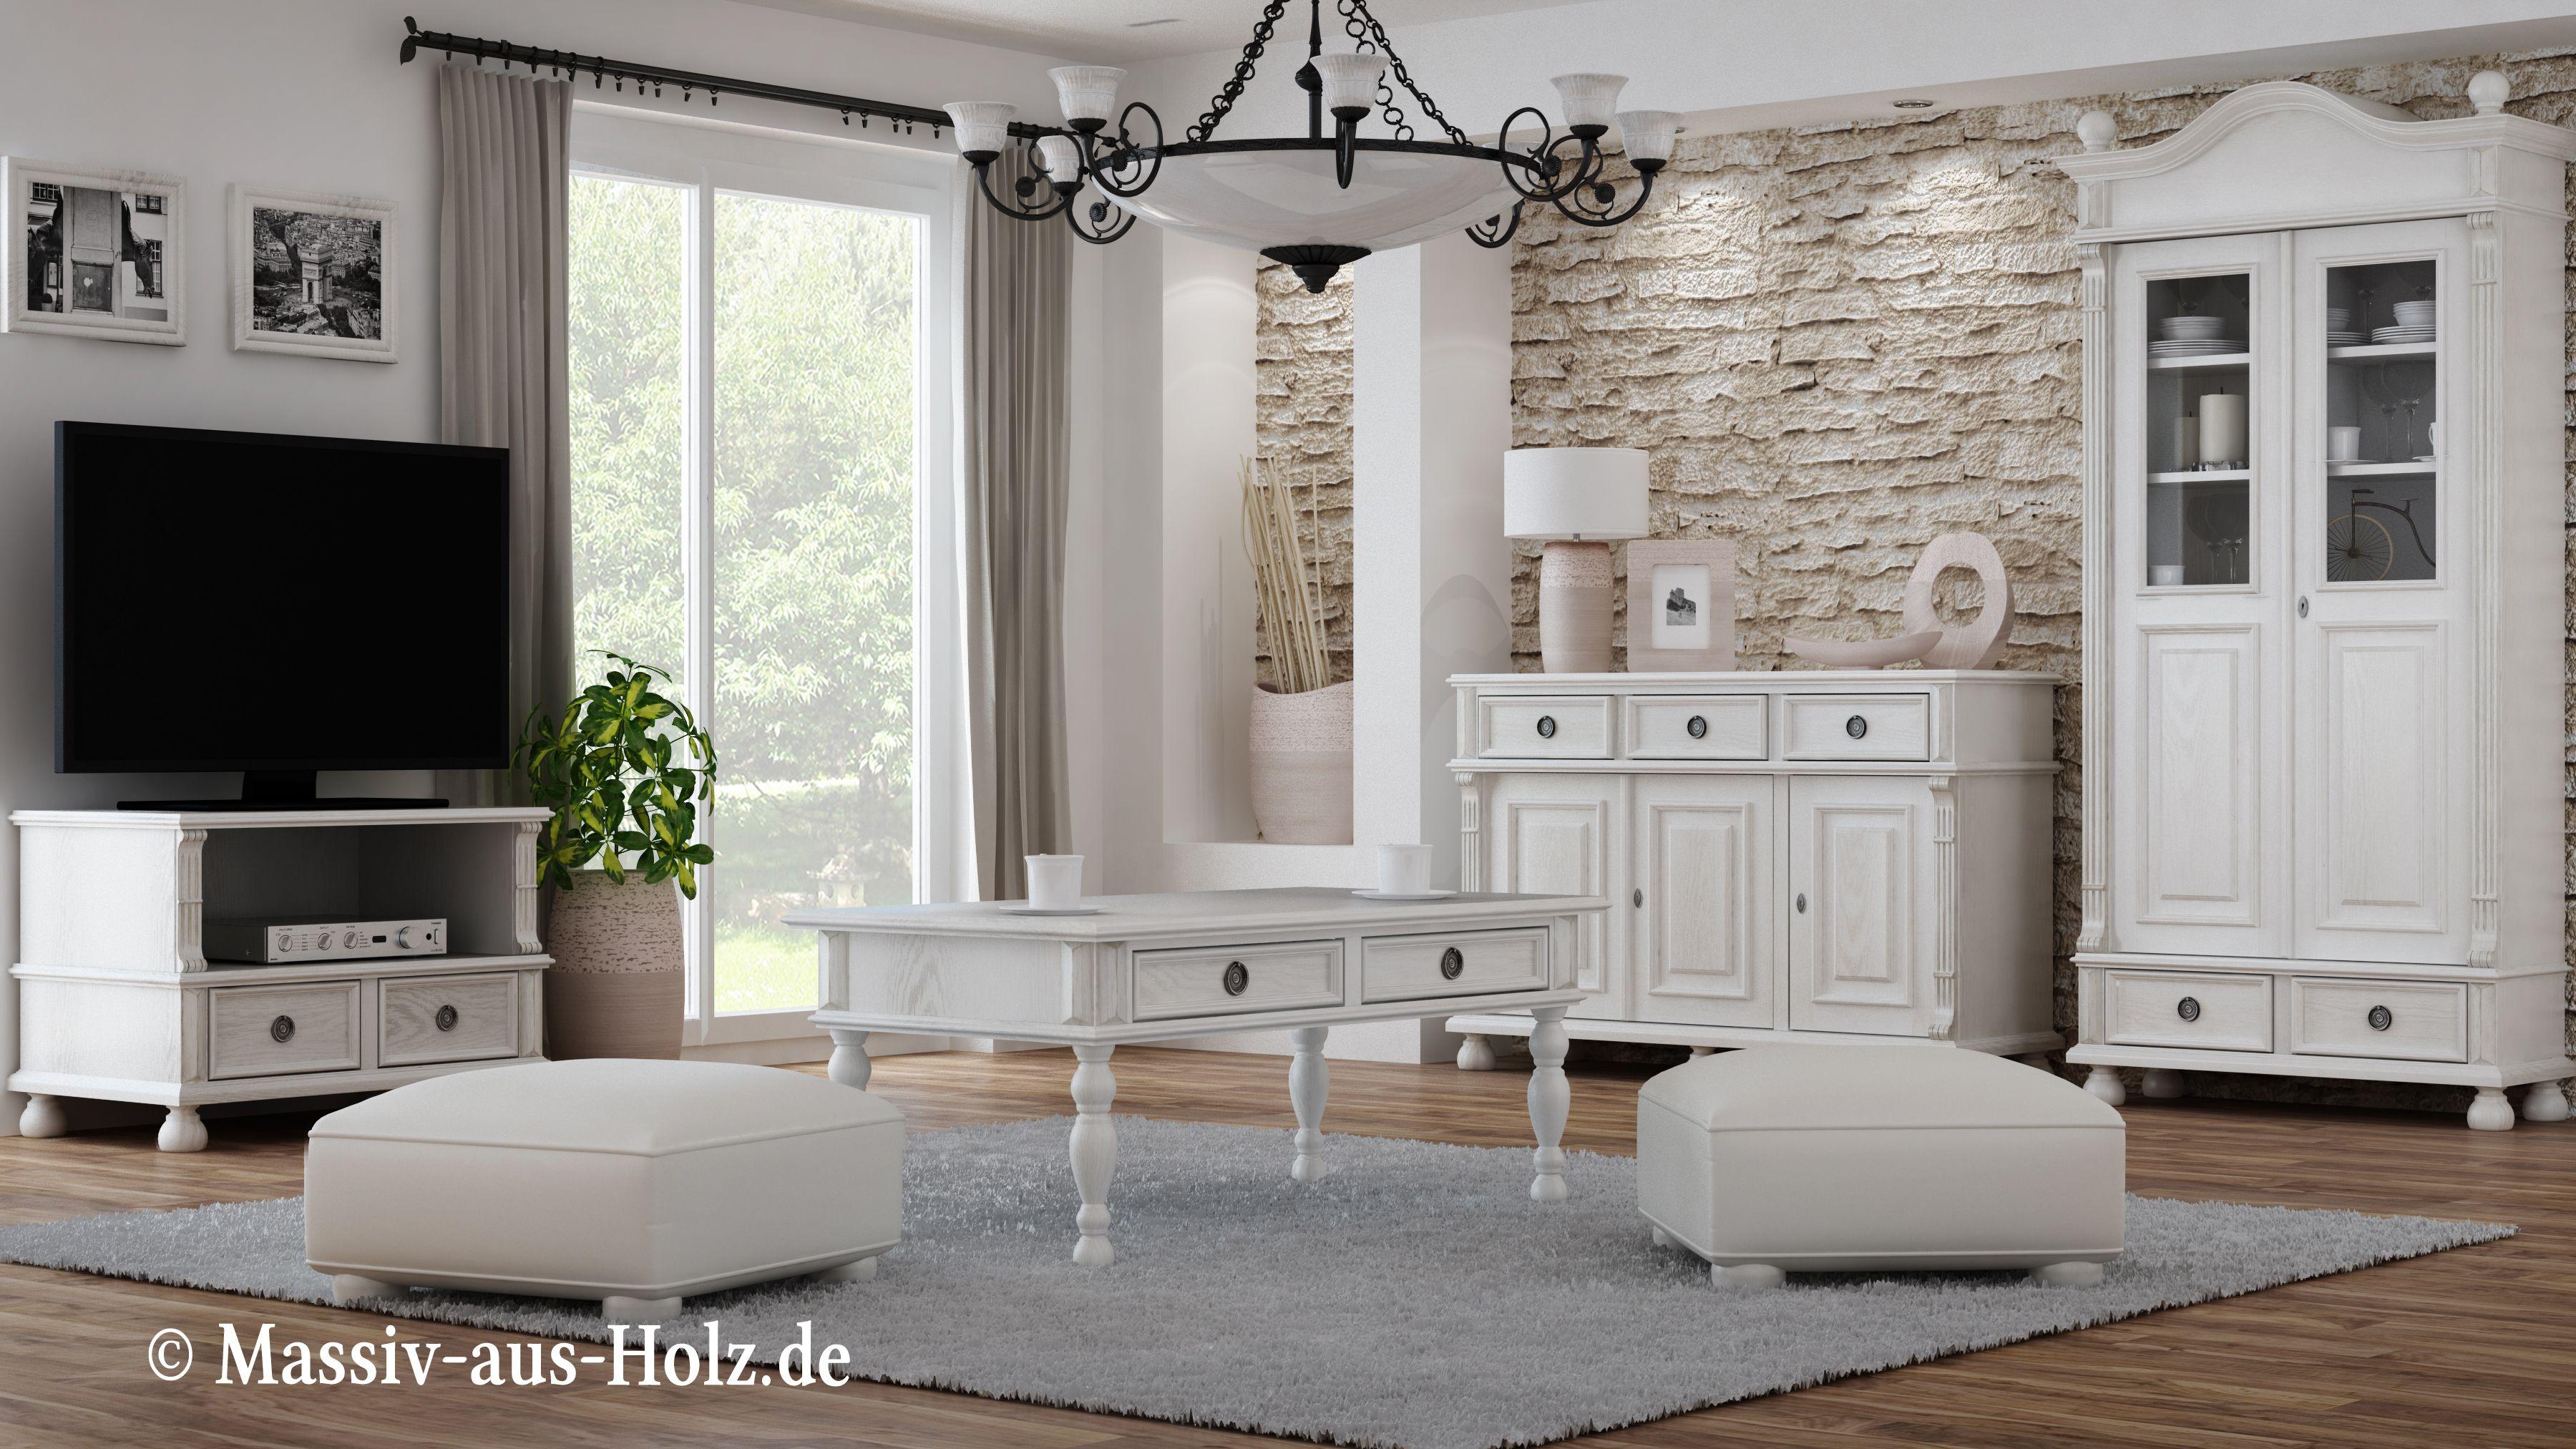 Happy place - white living room by massiv-aus-holz.de # ...